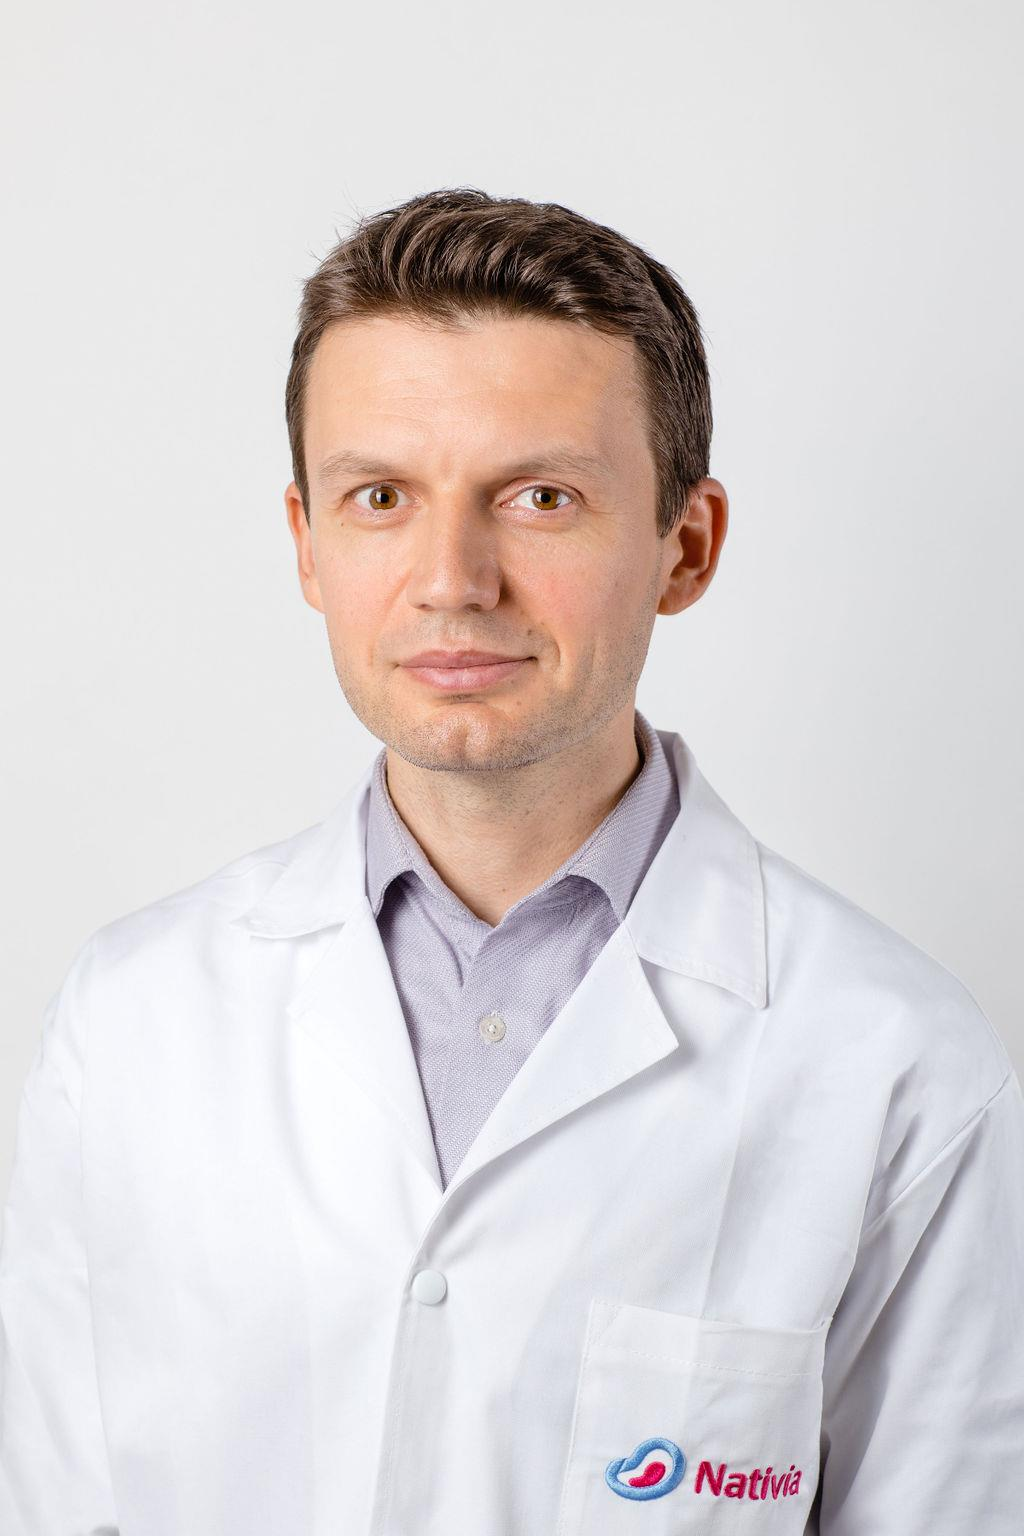 Dr. George Iancu